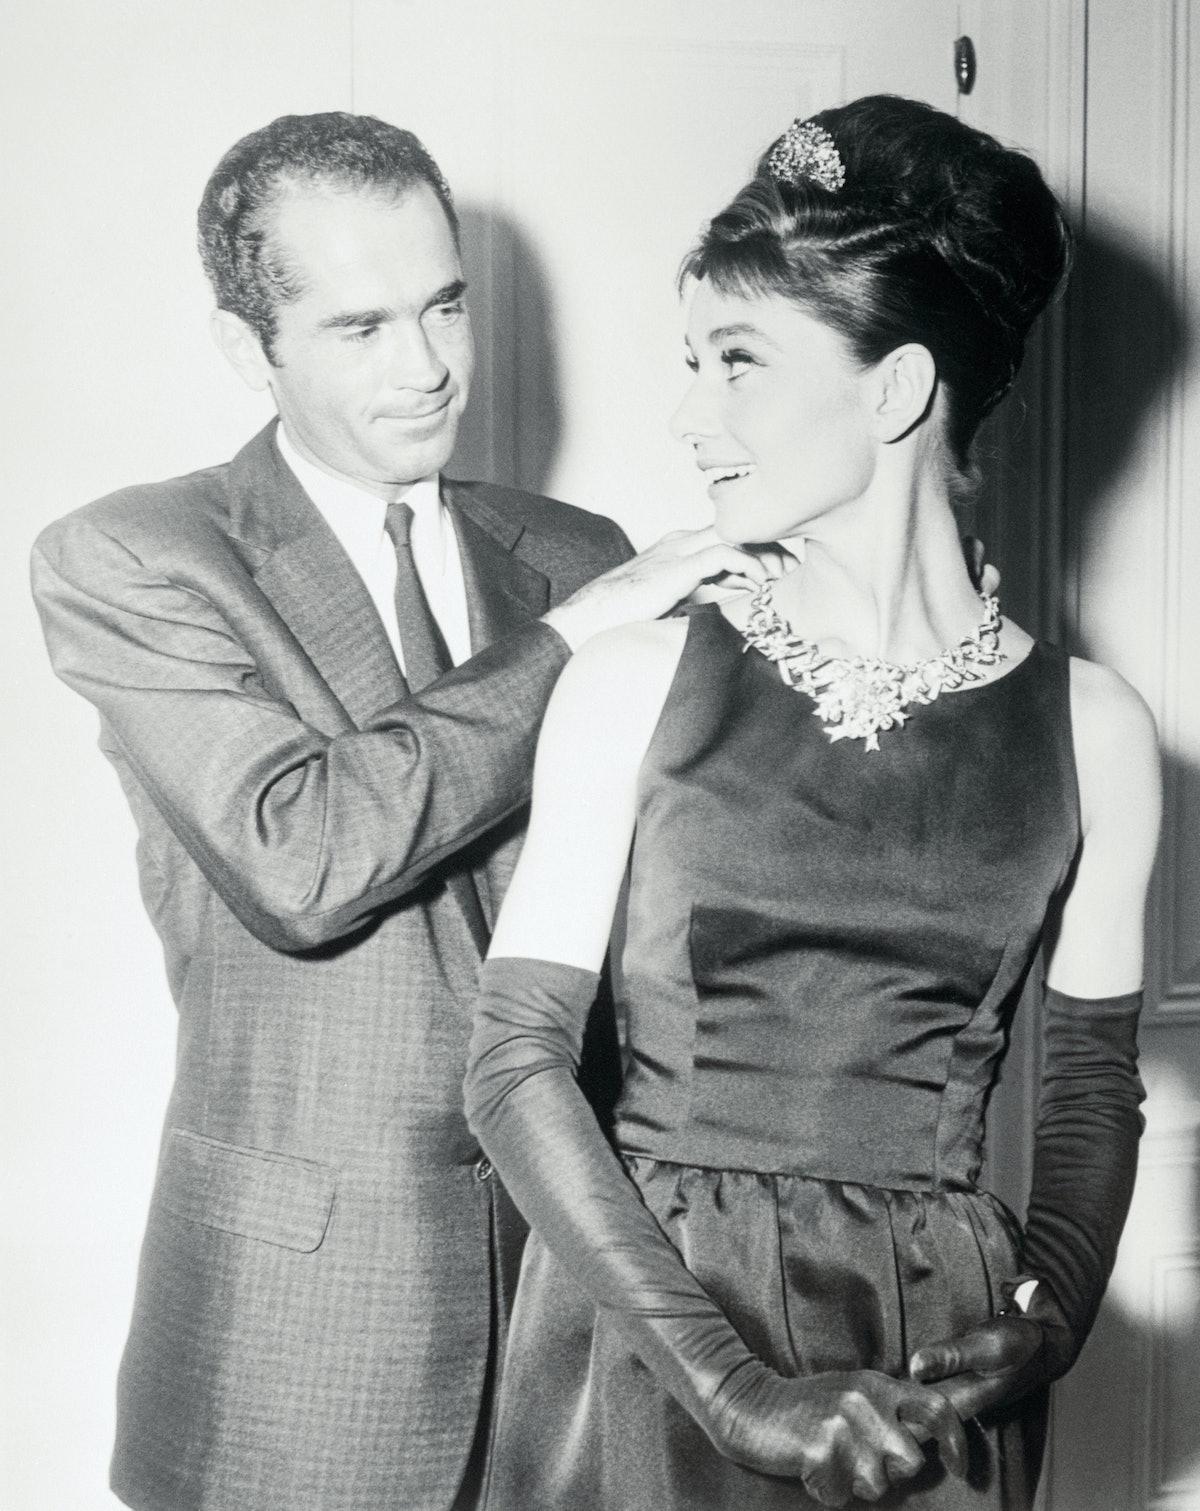 Film star Audrey Hepburn begins filming New York location scenes for Breakfast at Tiffany's, wearing...